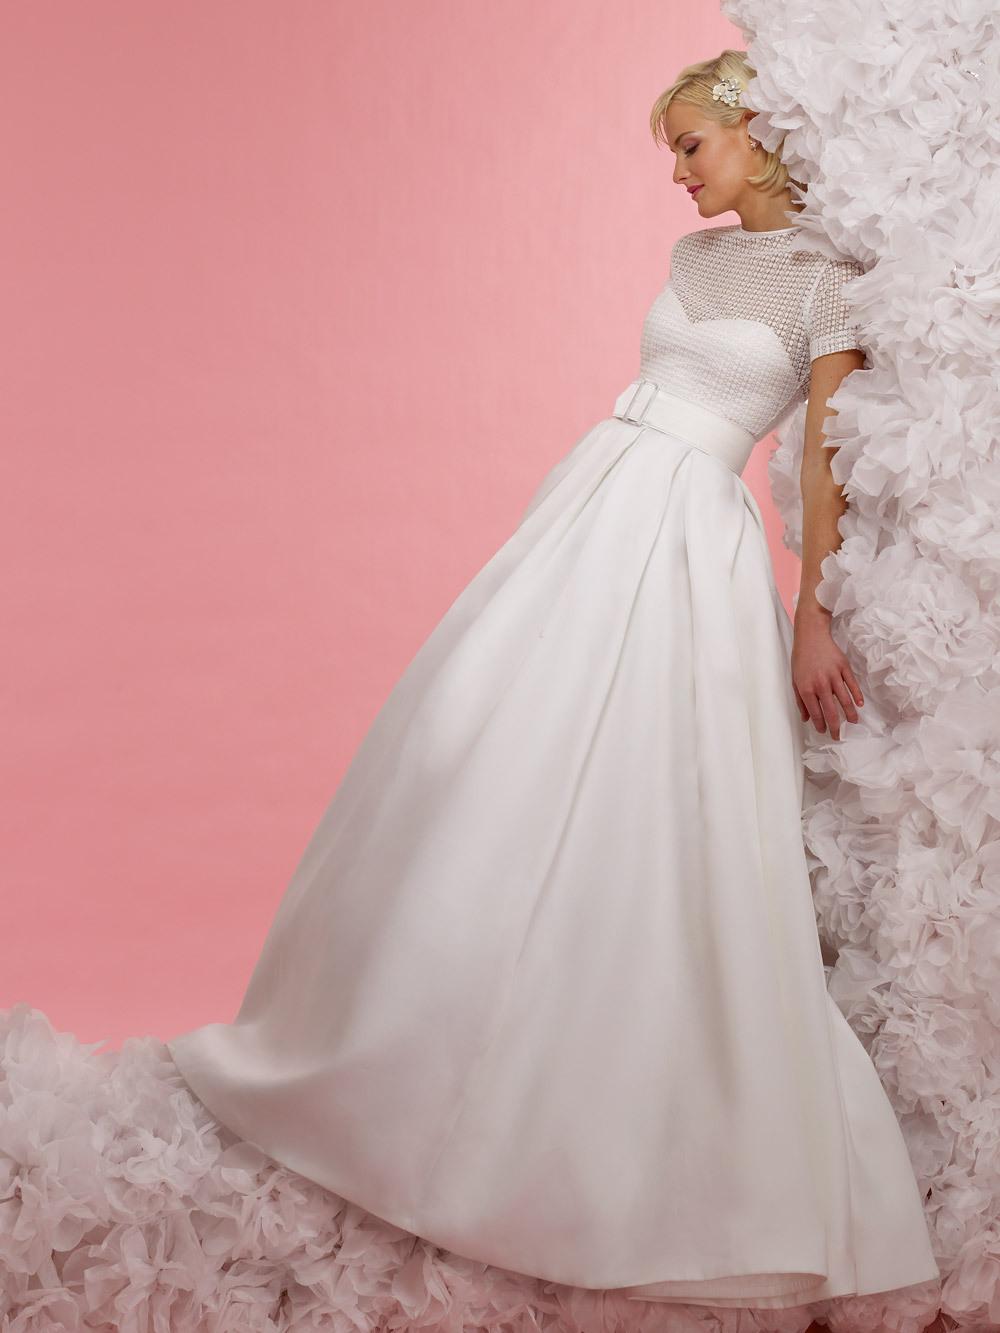 Vintage-inspired-wedding-dress-2012-bridal-gowns-steven-birnbaum-collection-kristen.full